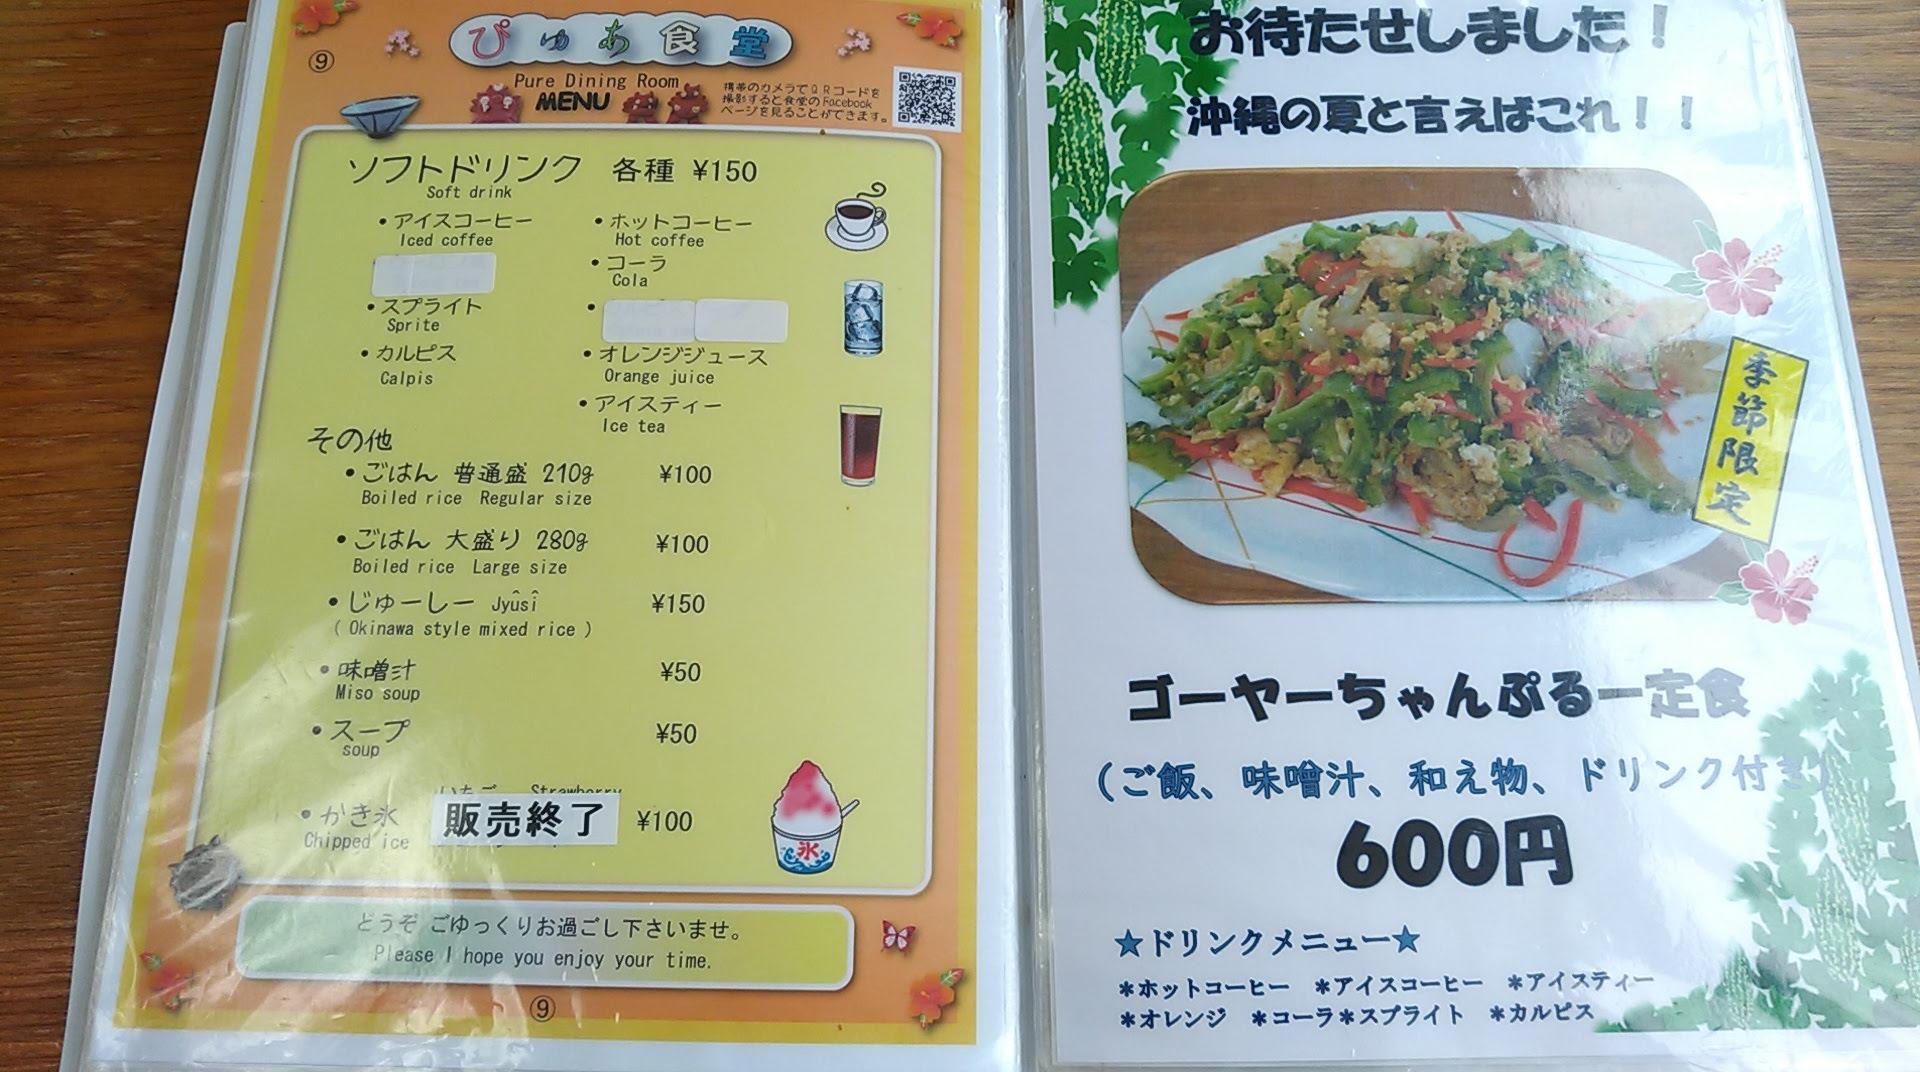 the menu of Pure shokudou 3